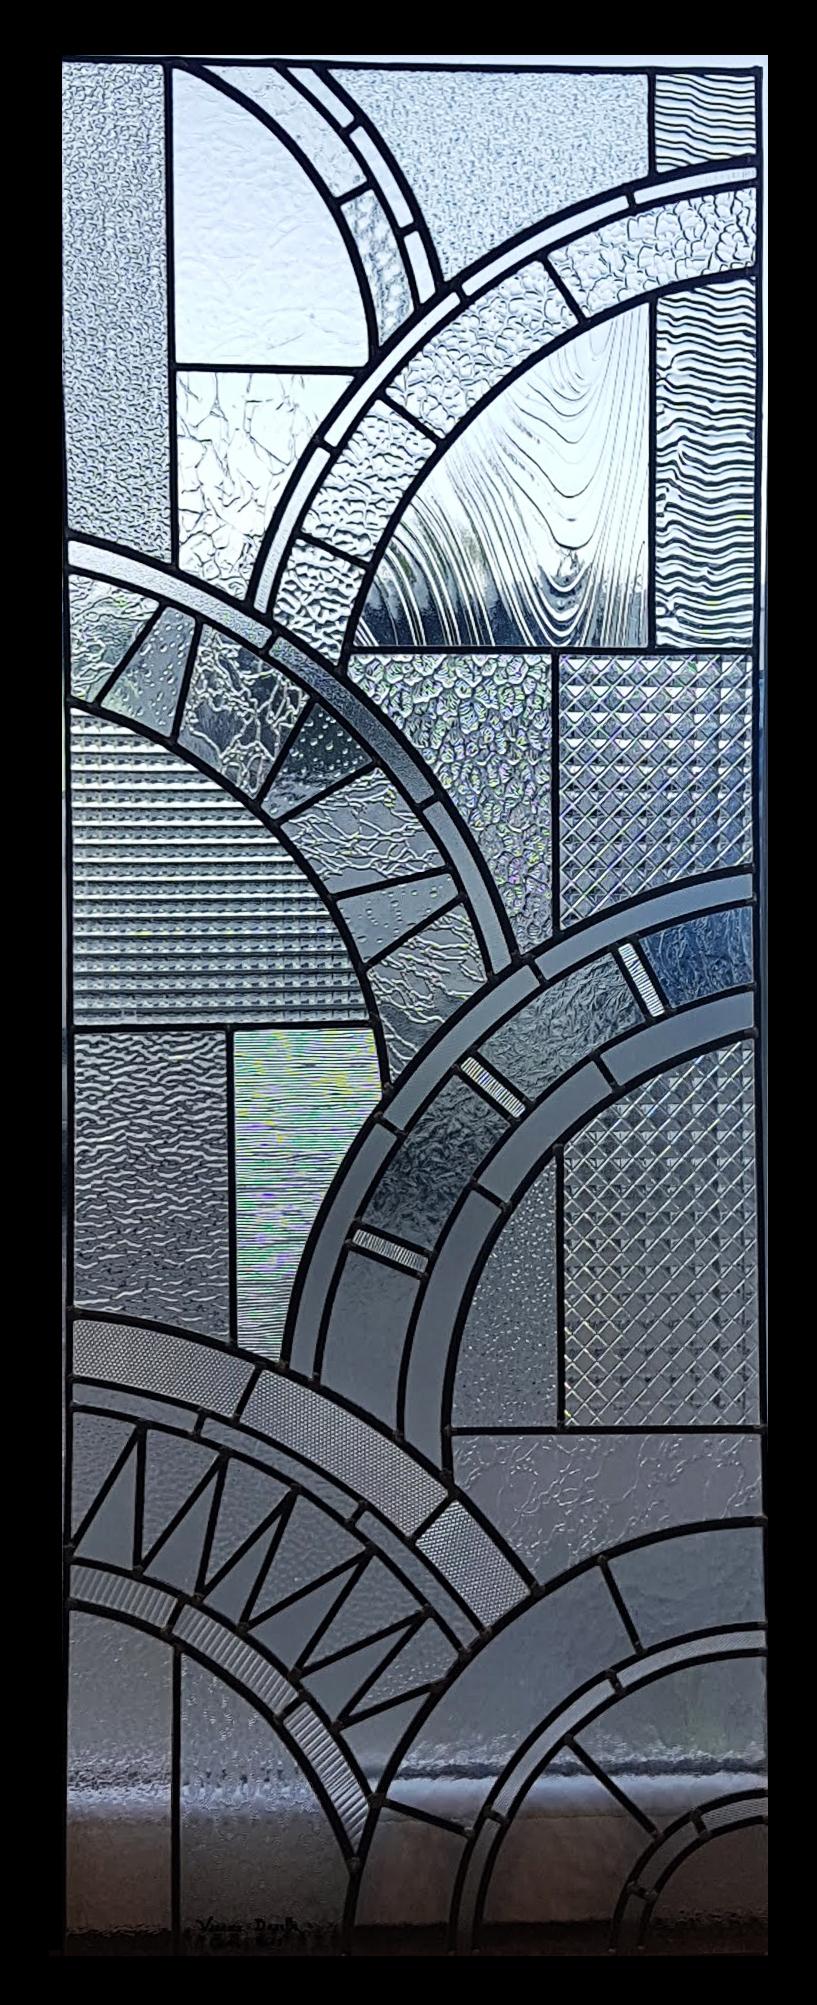 vitrail art d co isturiz vitraux d 39 art vanessa dazelle. Black Bedroom Furniture Sets. Home Design Ideas